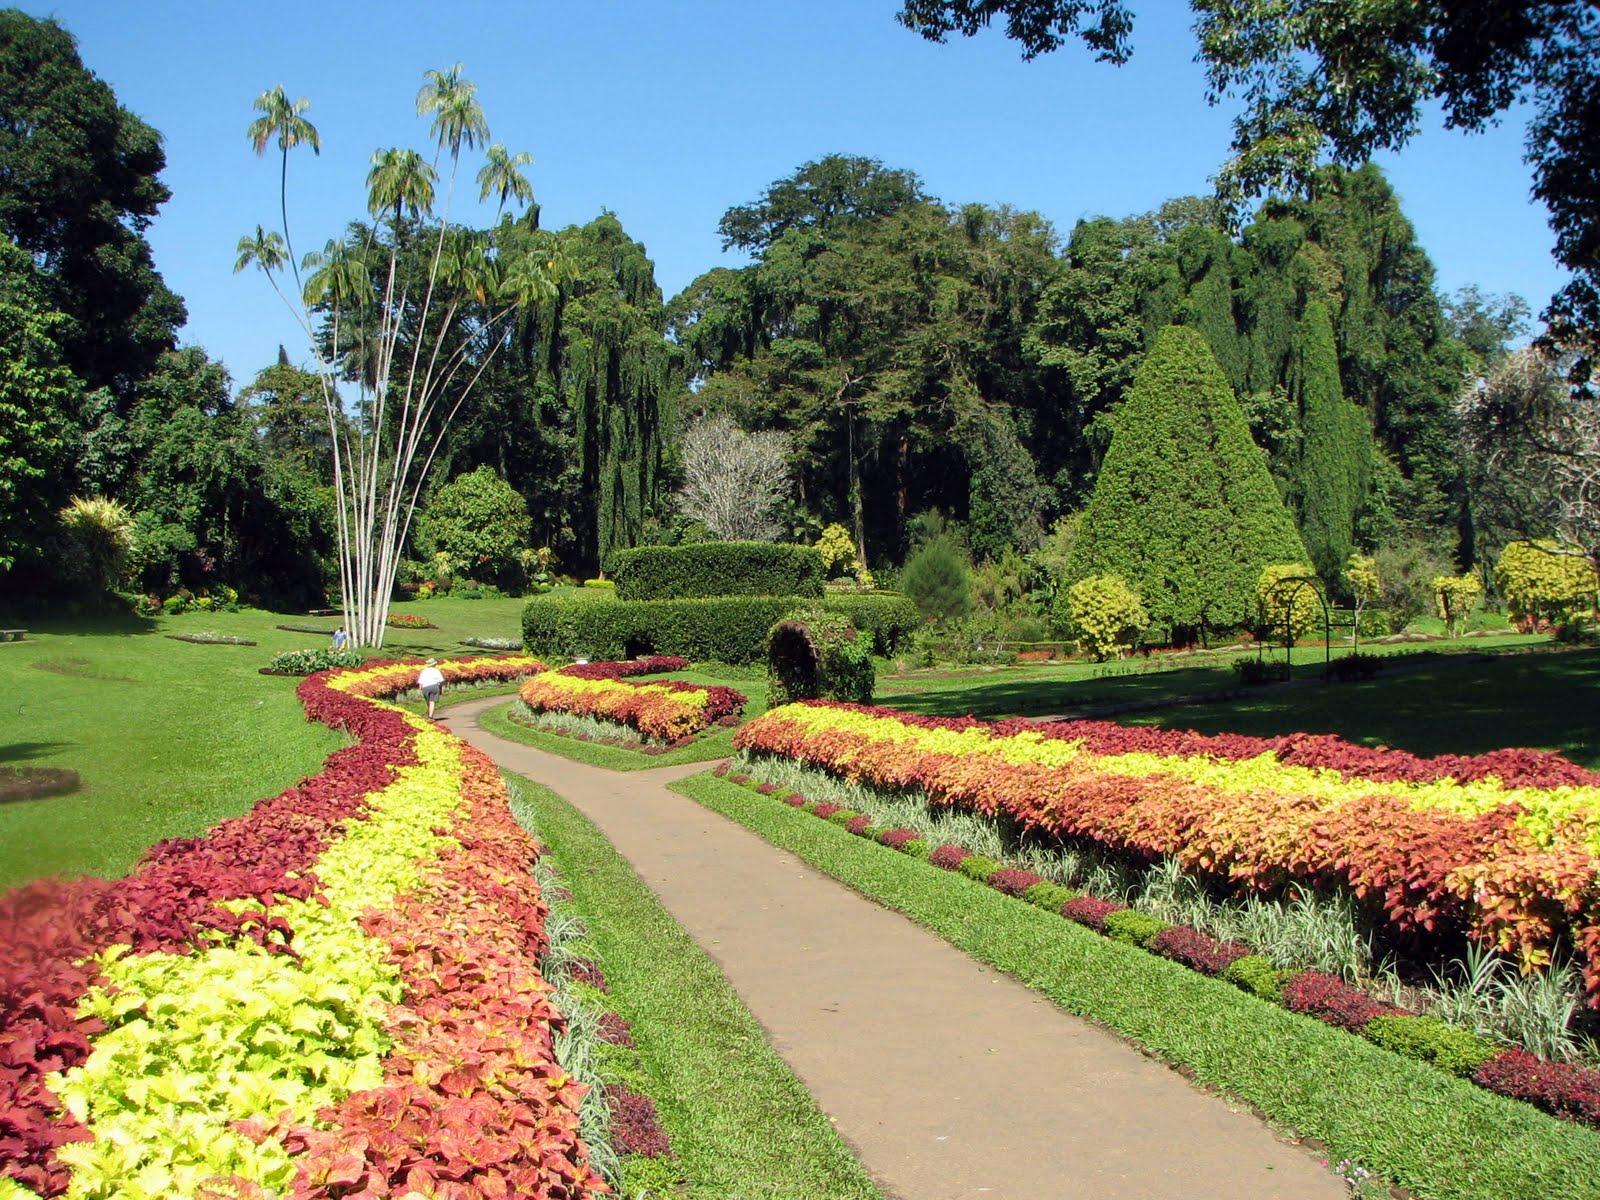 Best visit place botanical garden